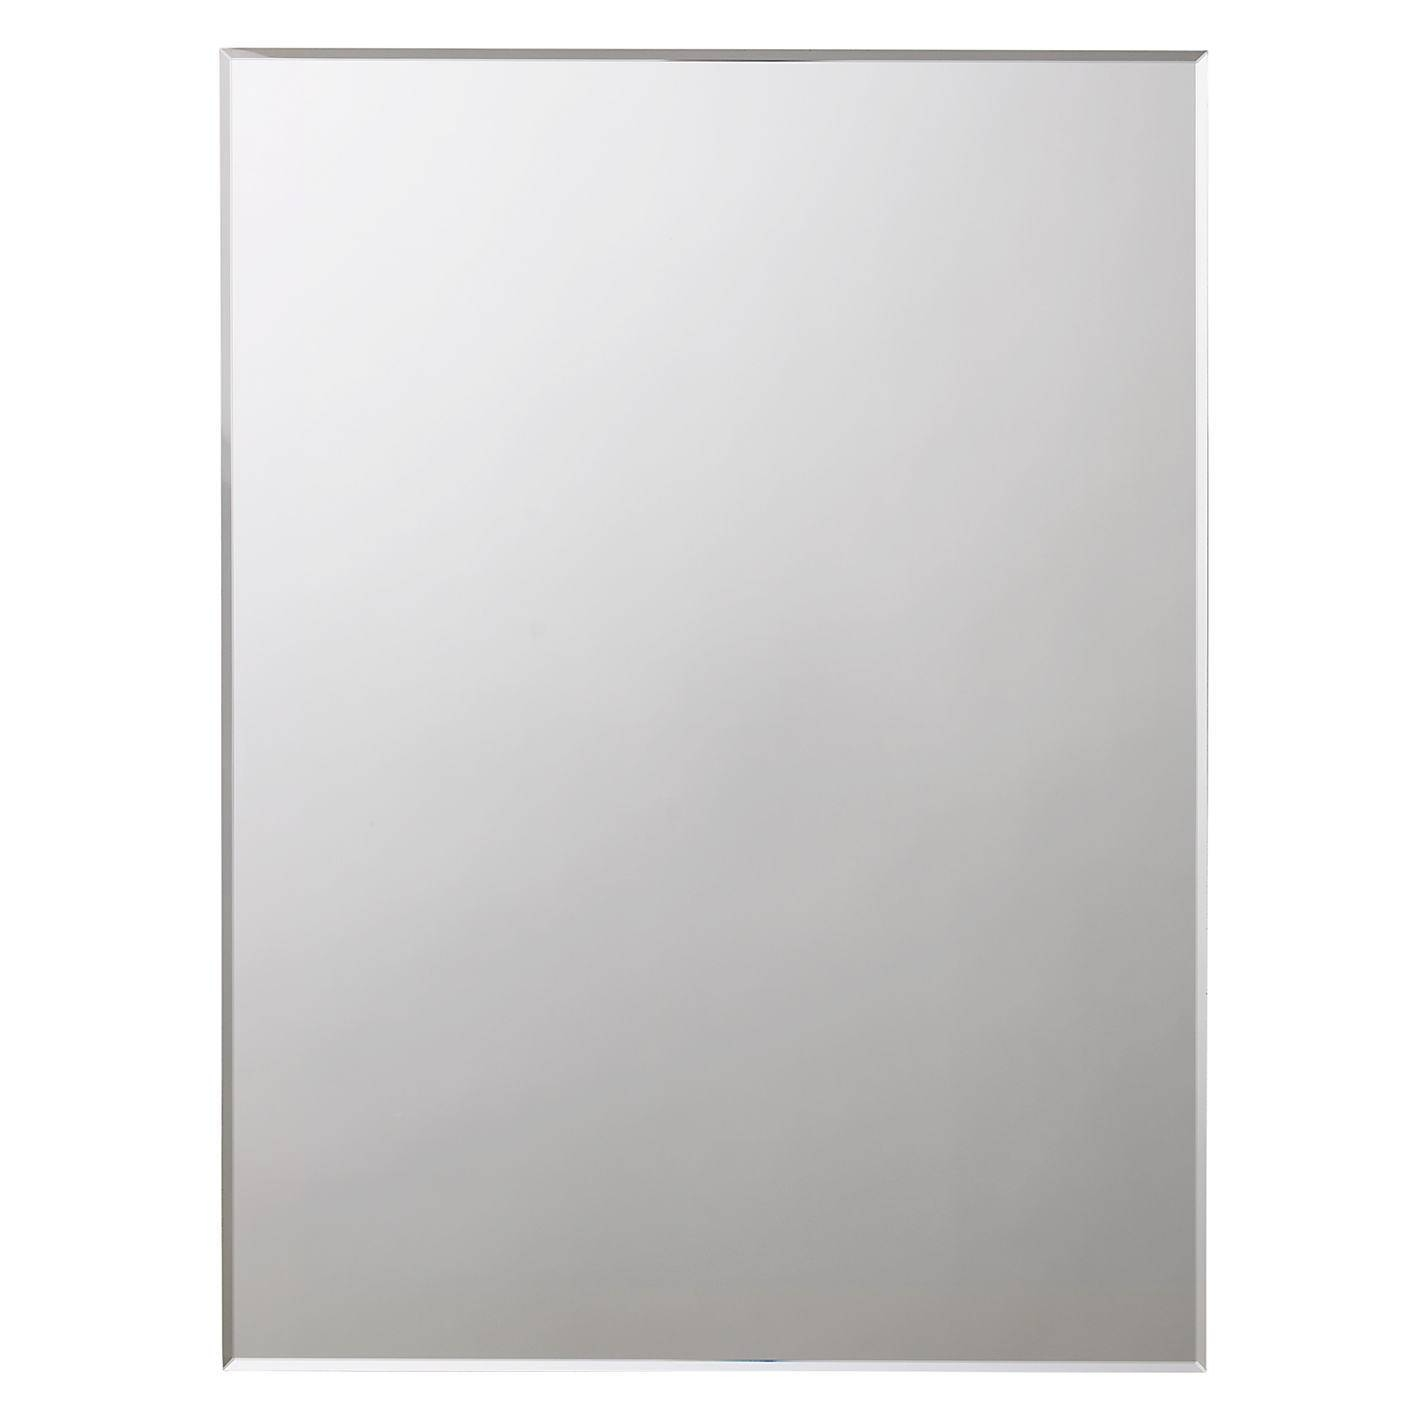 Marvelous Buy John Lewis Bevelled Edge Bathroom Mirror John Lewis Intended For Bevelled Edge Bathroom Mirrors (View 10 of 15)